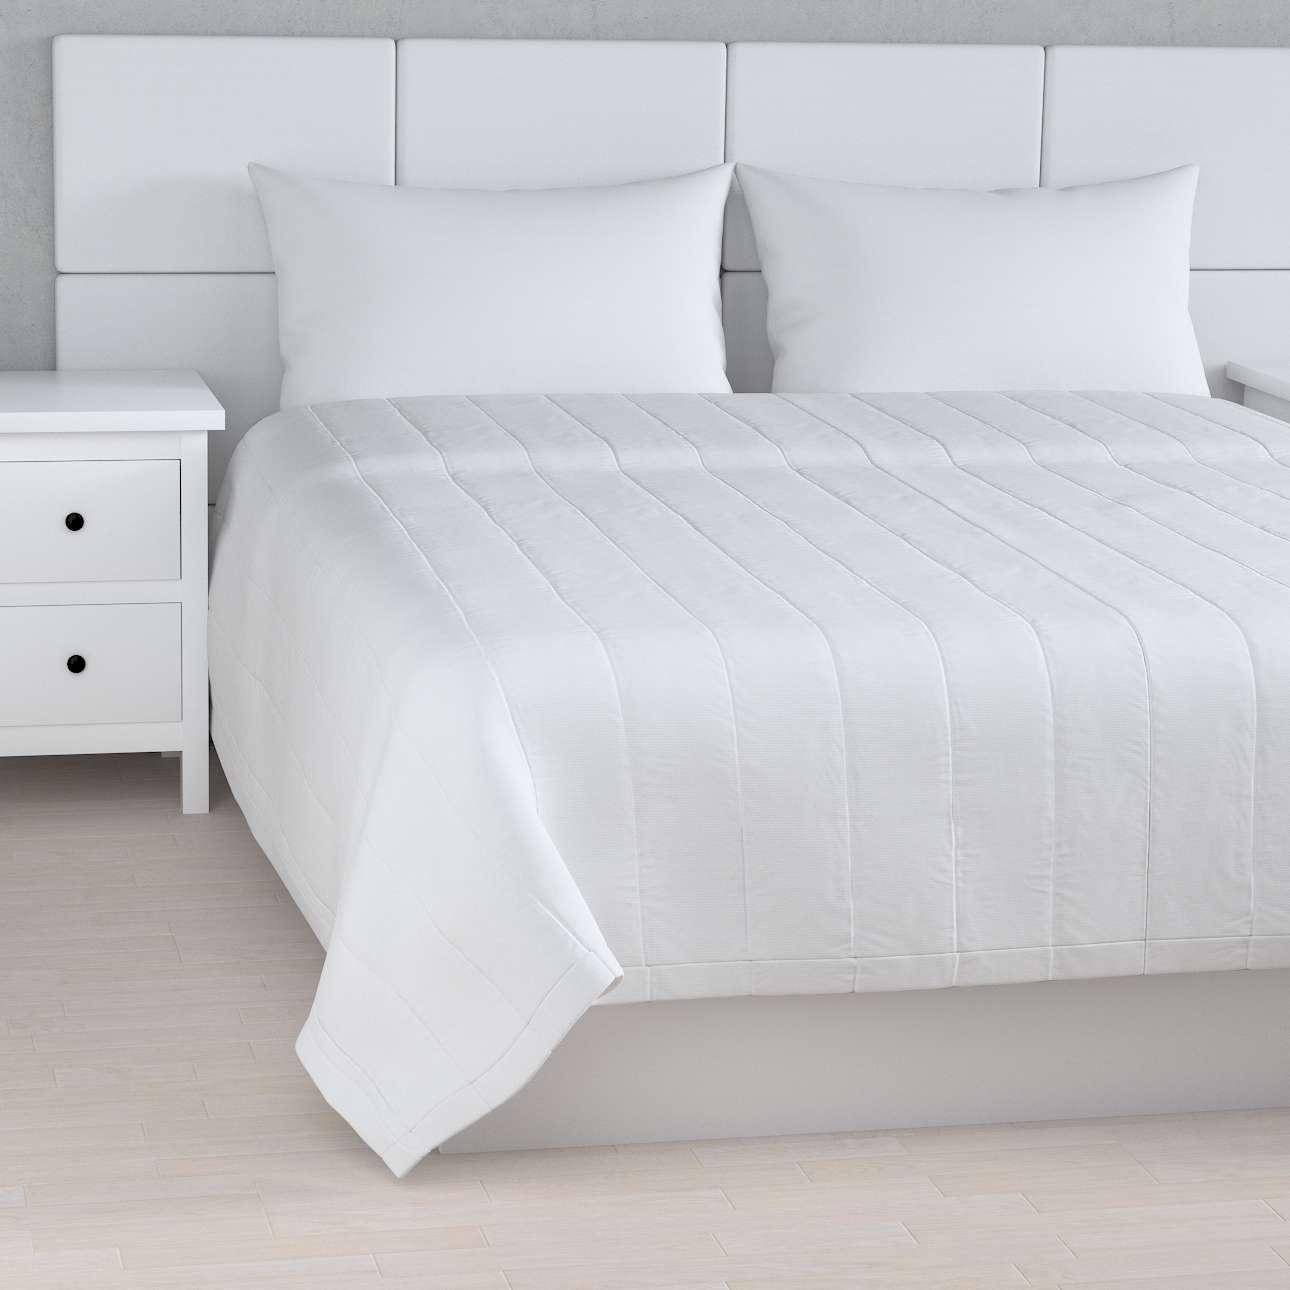 Prehoz na posteľ jednoduchý V kolekcii Jupiter, tkanina: 127-01